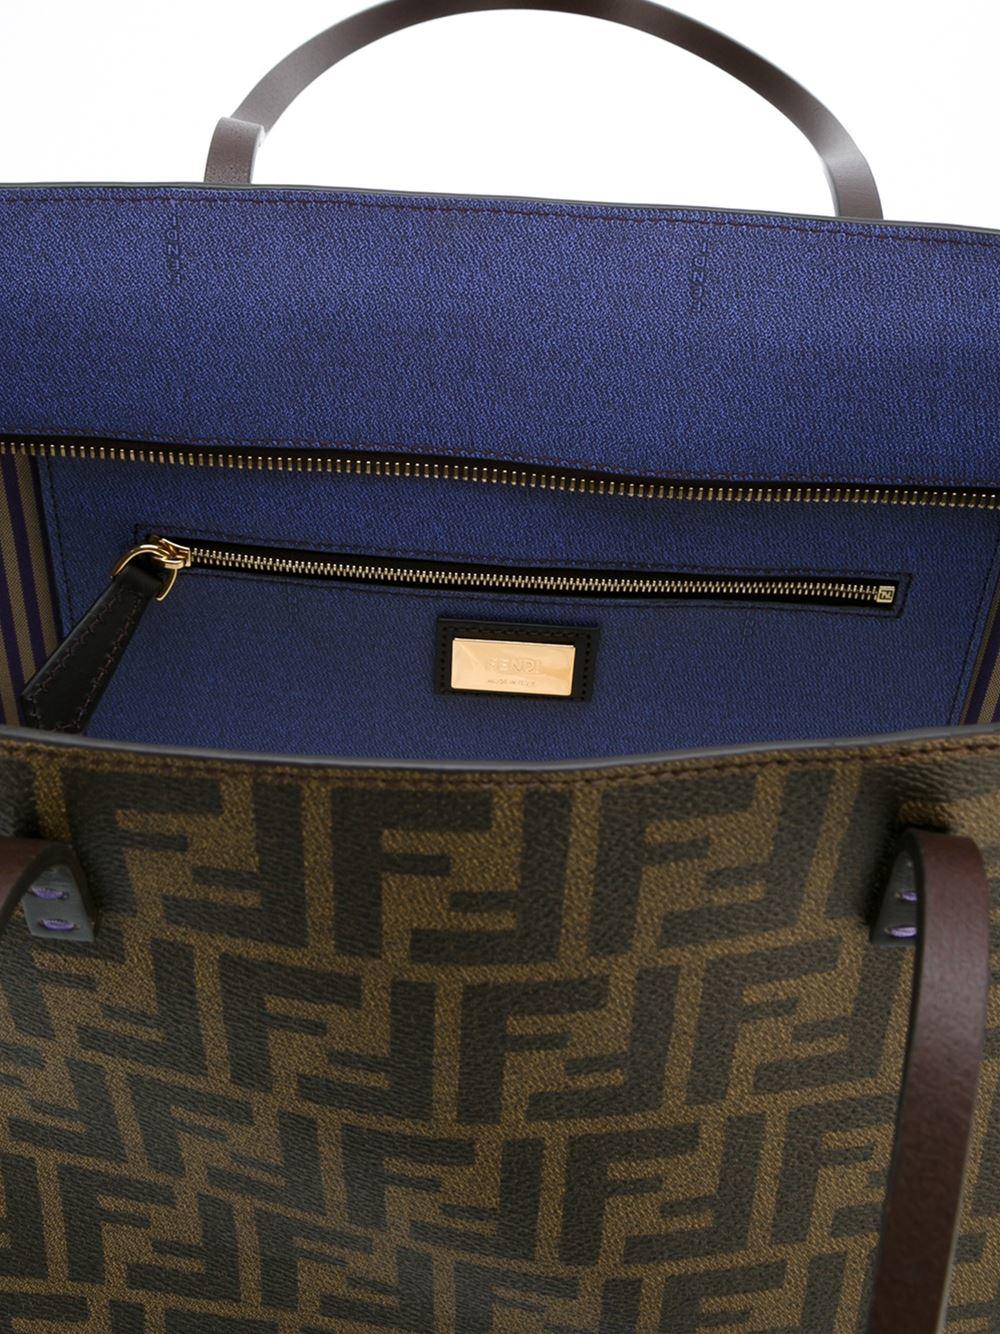 2285874611e8 ... discount code for fendi roll bag zucca in brown lyst 50592 952a9